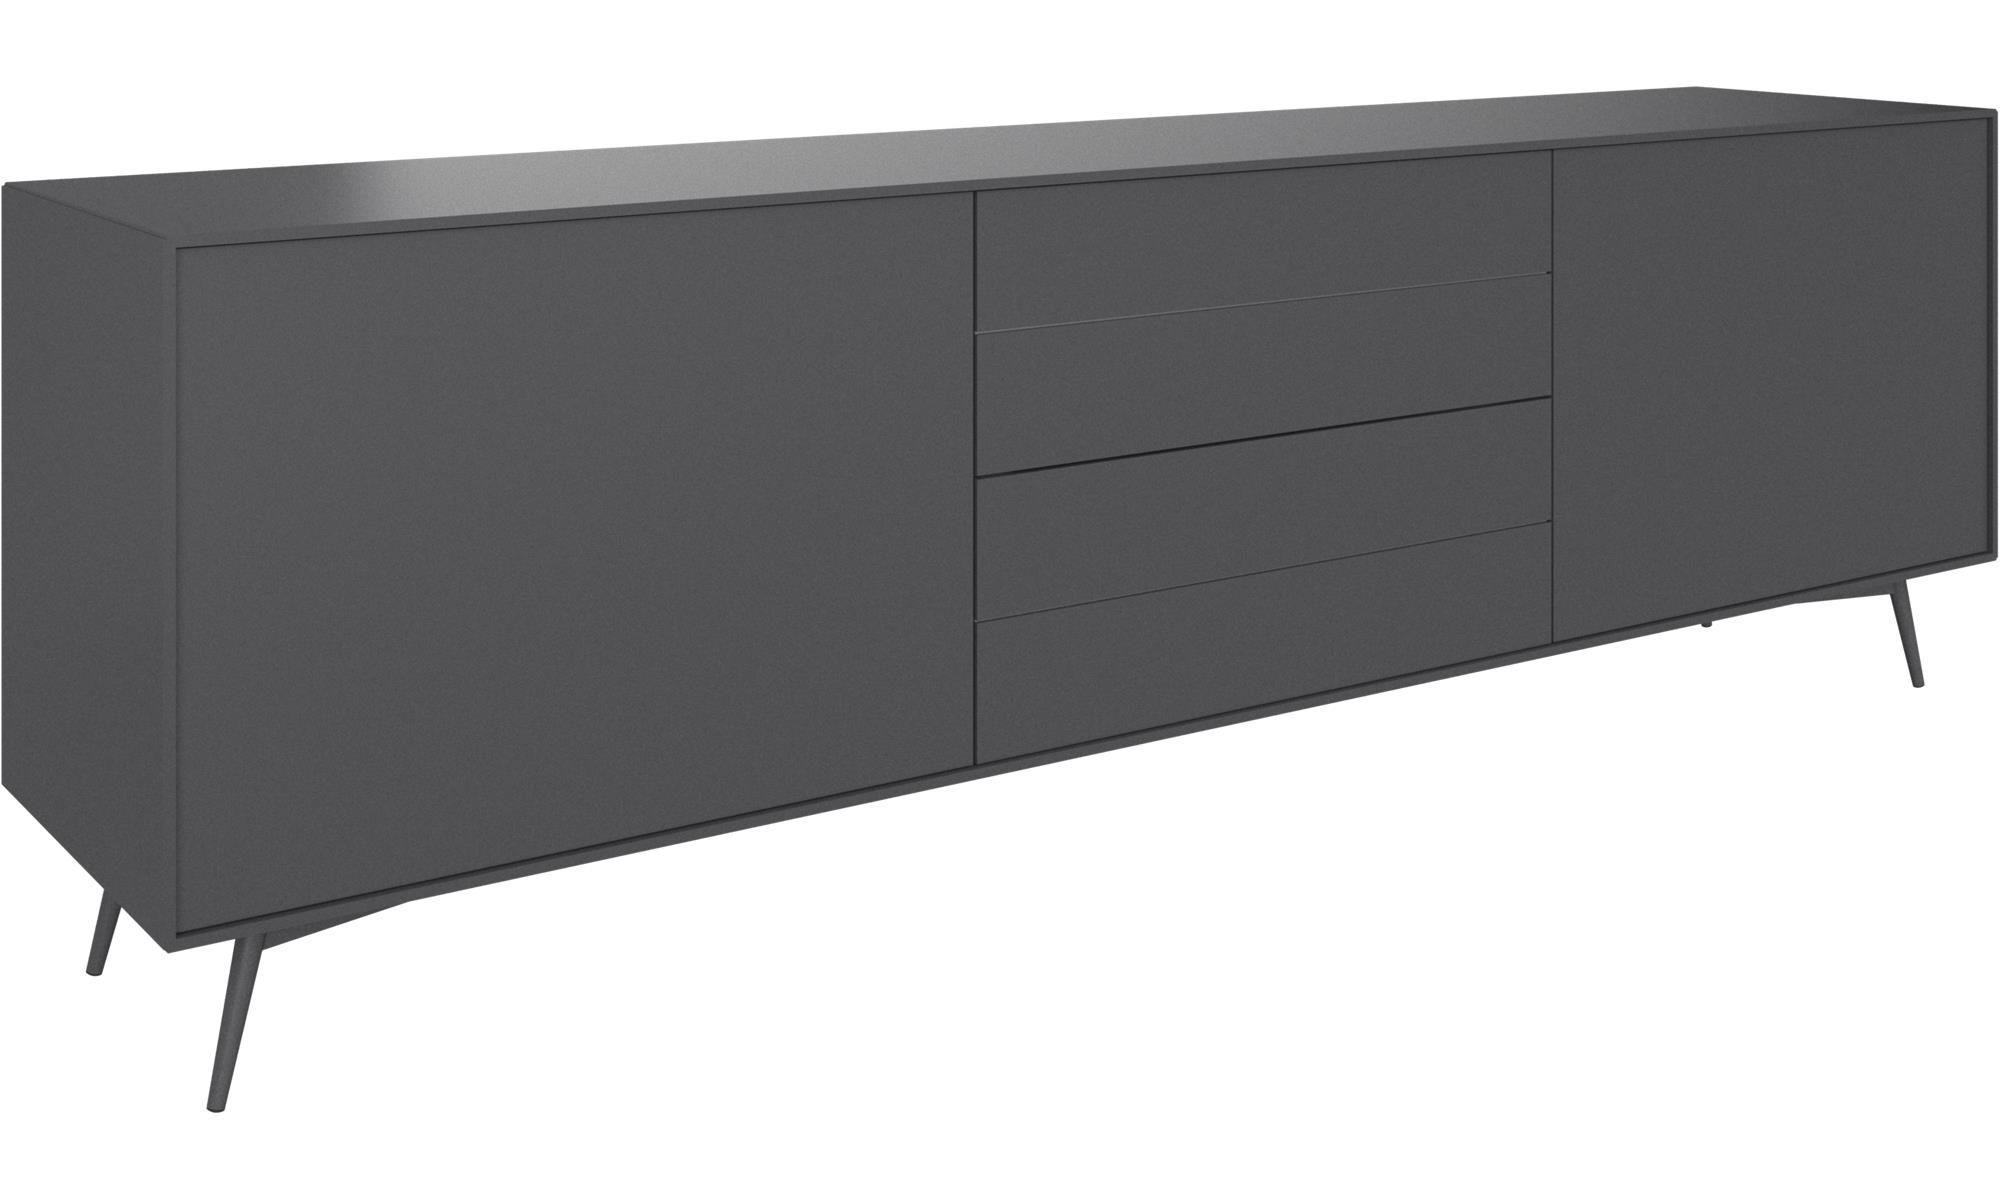 sideboards fermo sideboard grau lack wohnung in 2018 pinterest wohnzimmer boconcept. Black Bedroom Furniture Sets. Home Design Ideas